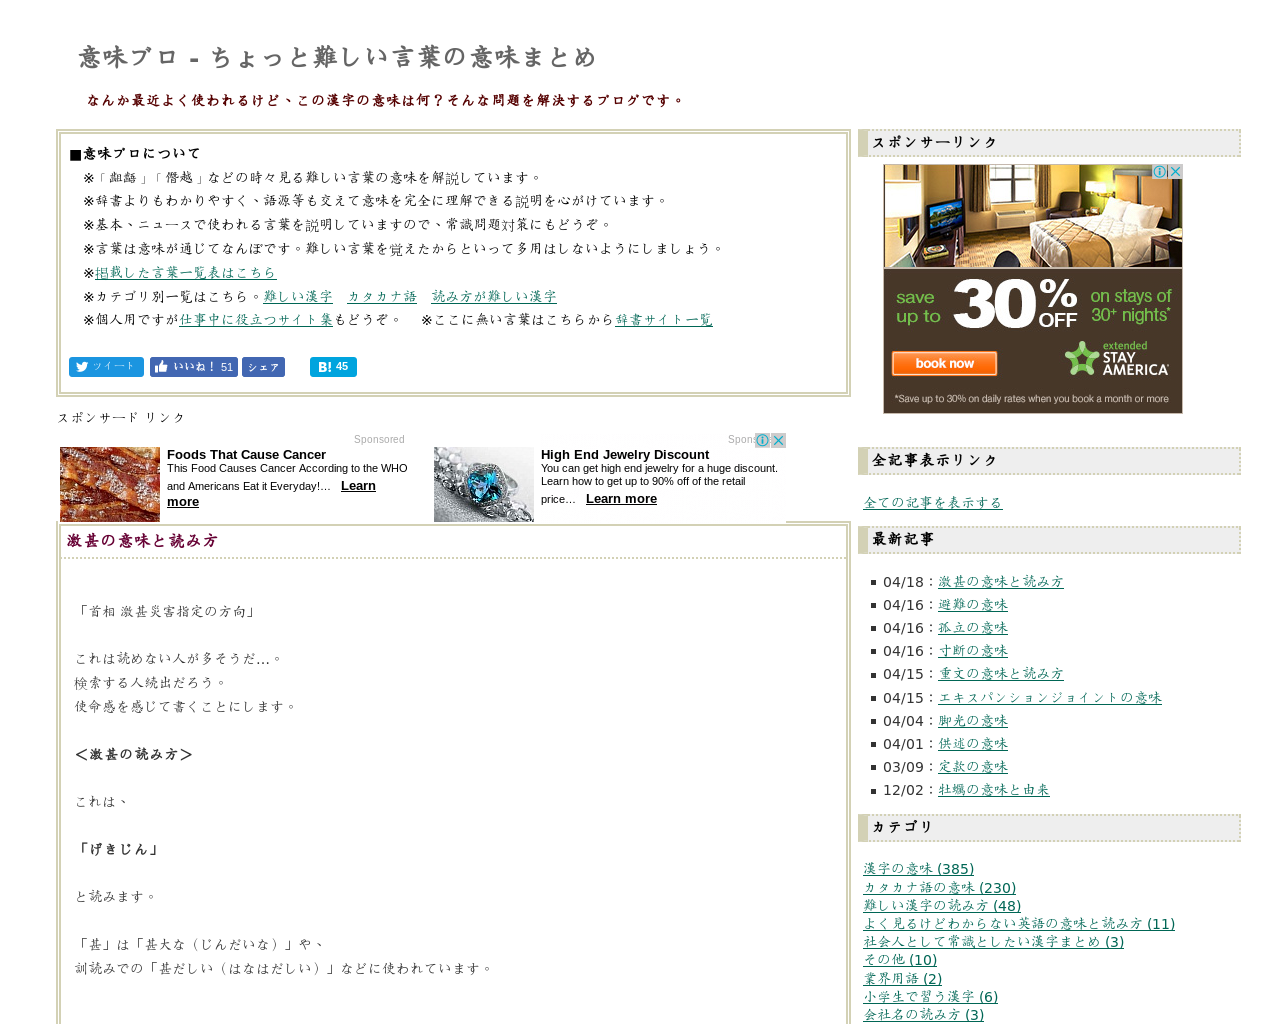 whatimi.blog135.fc2.com(2017/12/02 14:10:11)